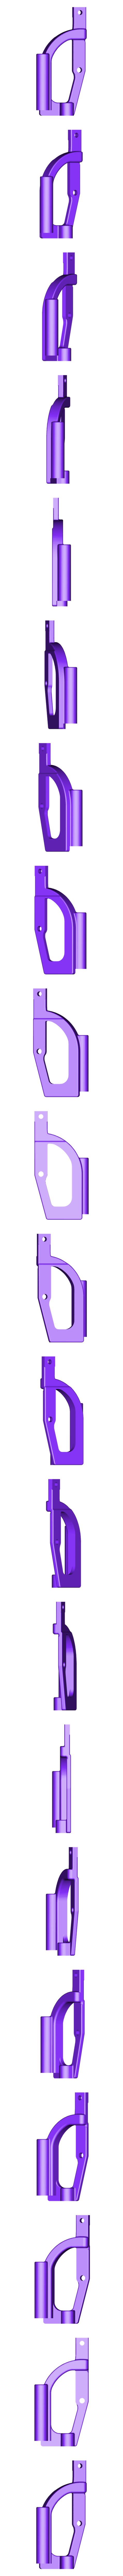 Fork-RH.STL Download free STL file Automata-4 Ben rides around the clock • 3D printer template, woodenclocks